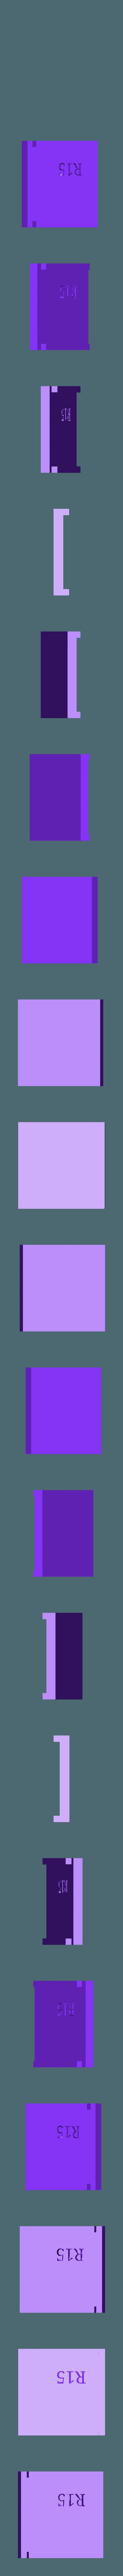 tapa.stl Download free STL file Box • 3D printing object, Raulbaeza15